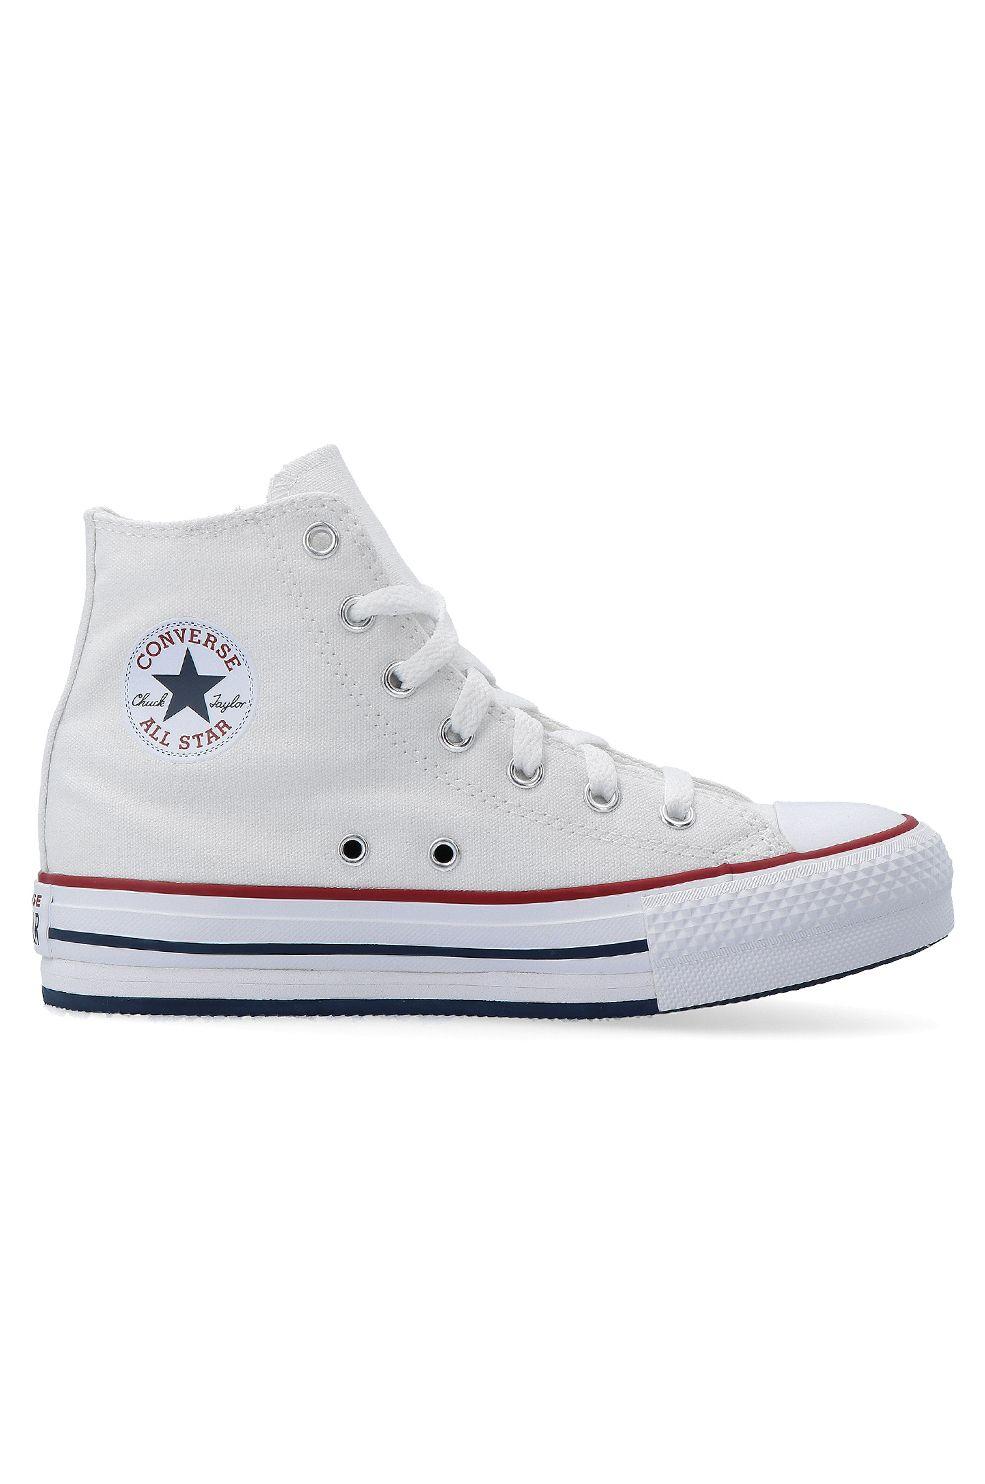 Converse Shoes CHUCK TAYLOR ALL STAR EVA LIFT HI White/Garnet/Midnight Navy